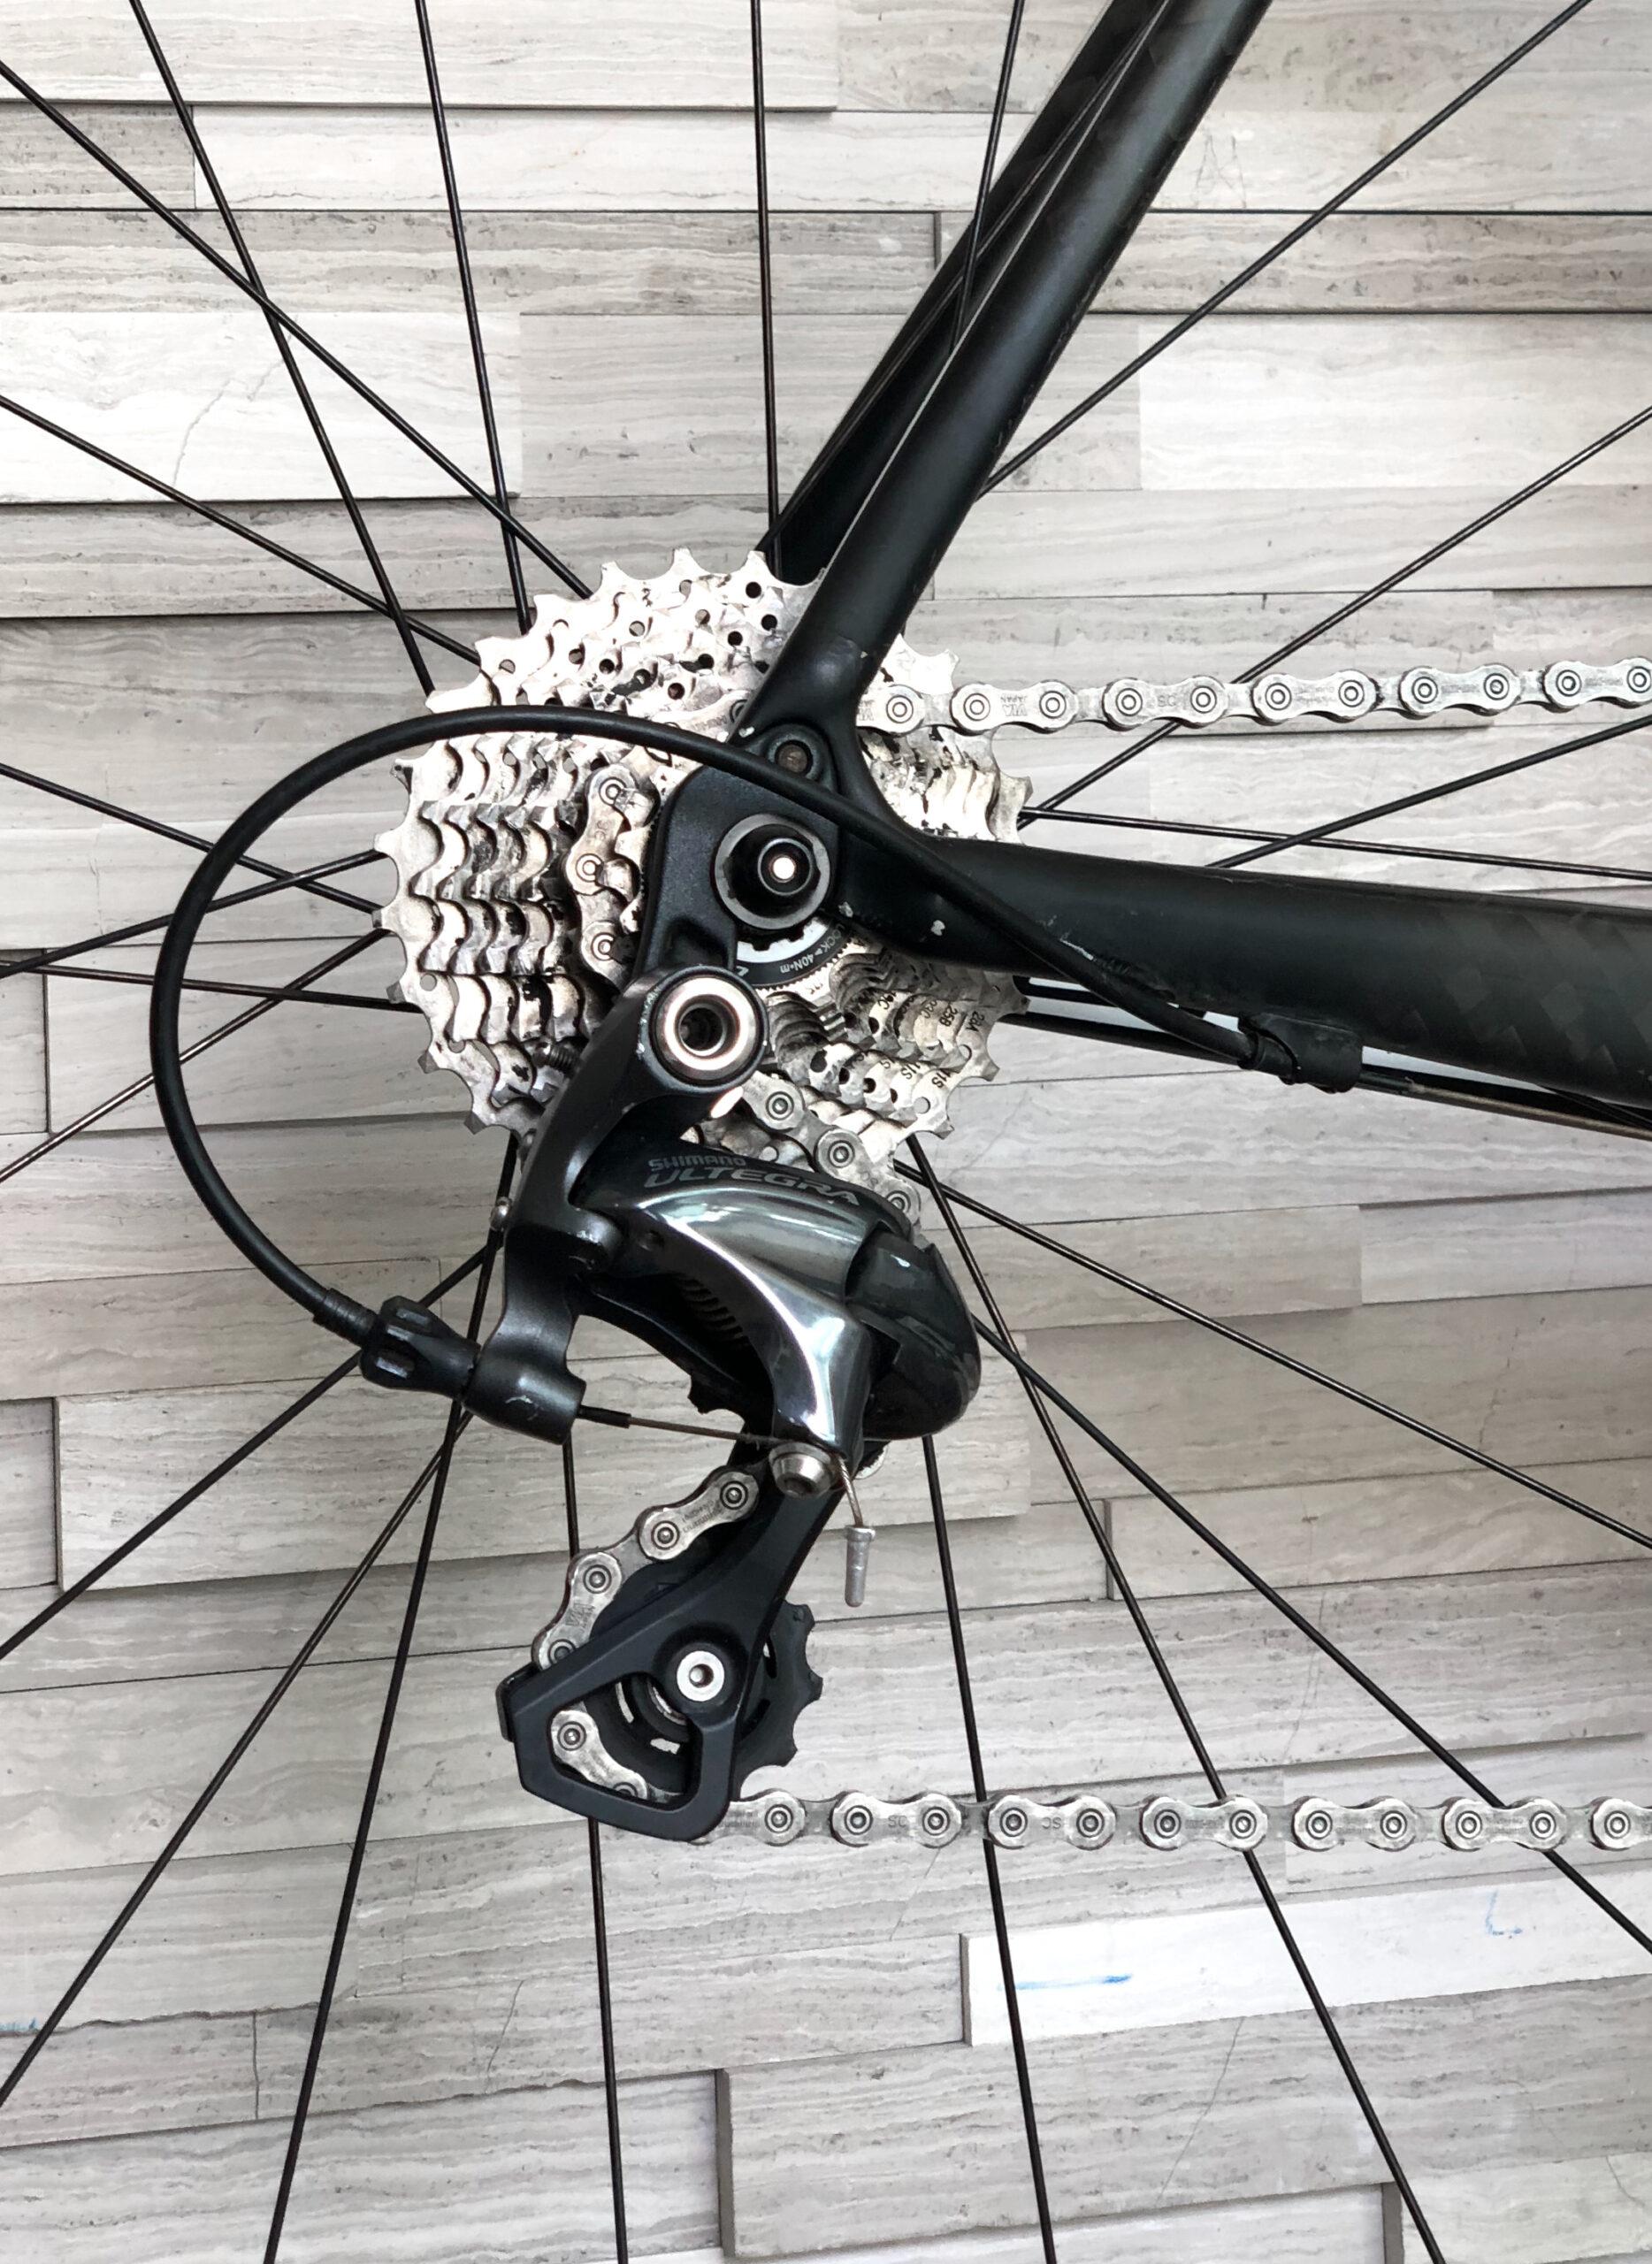 Specialized Tarmac SL2 Full Carbon Pro Road Bike Ultegra 6800 11 speed 56 cm